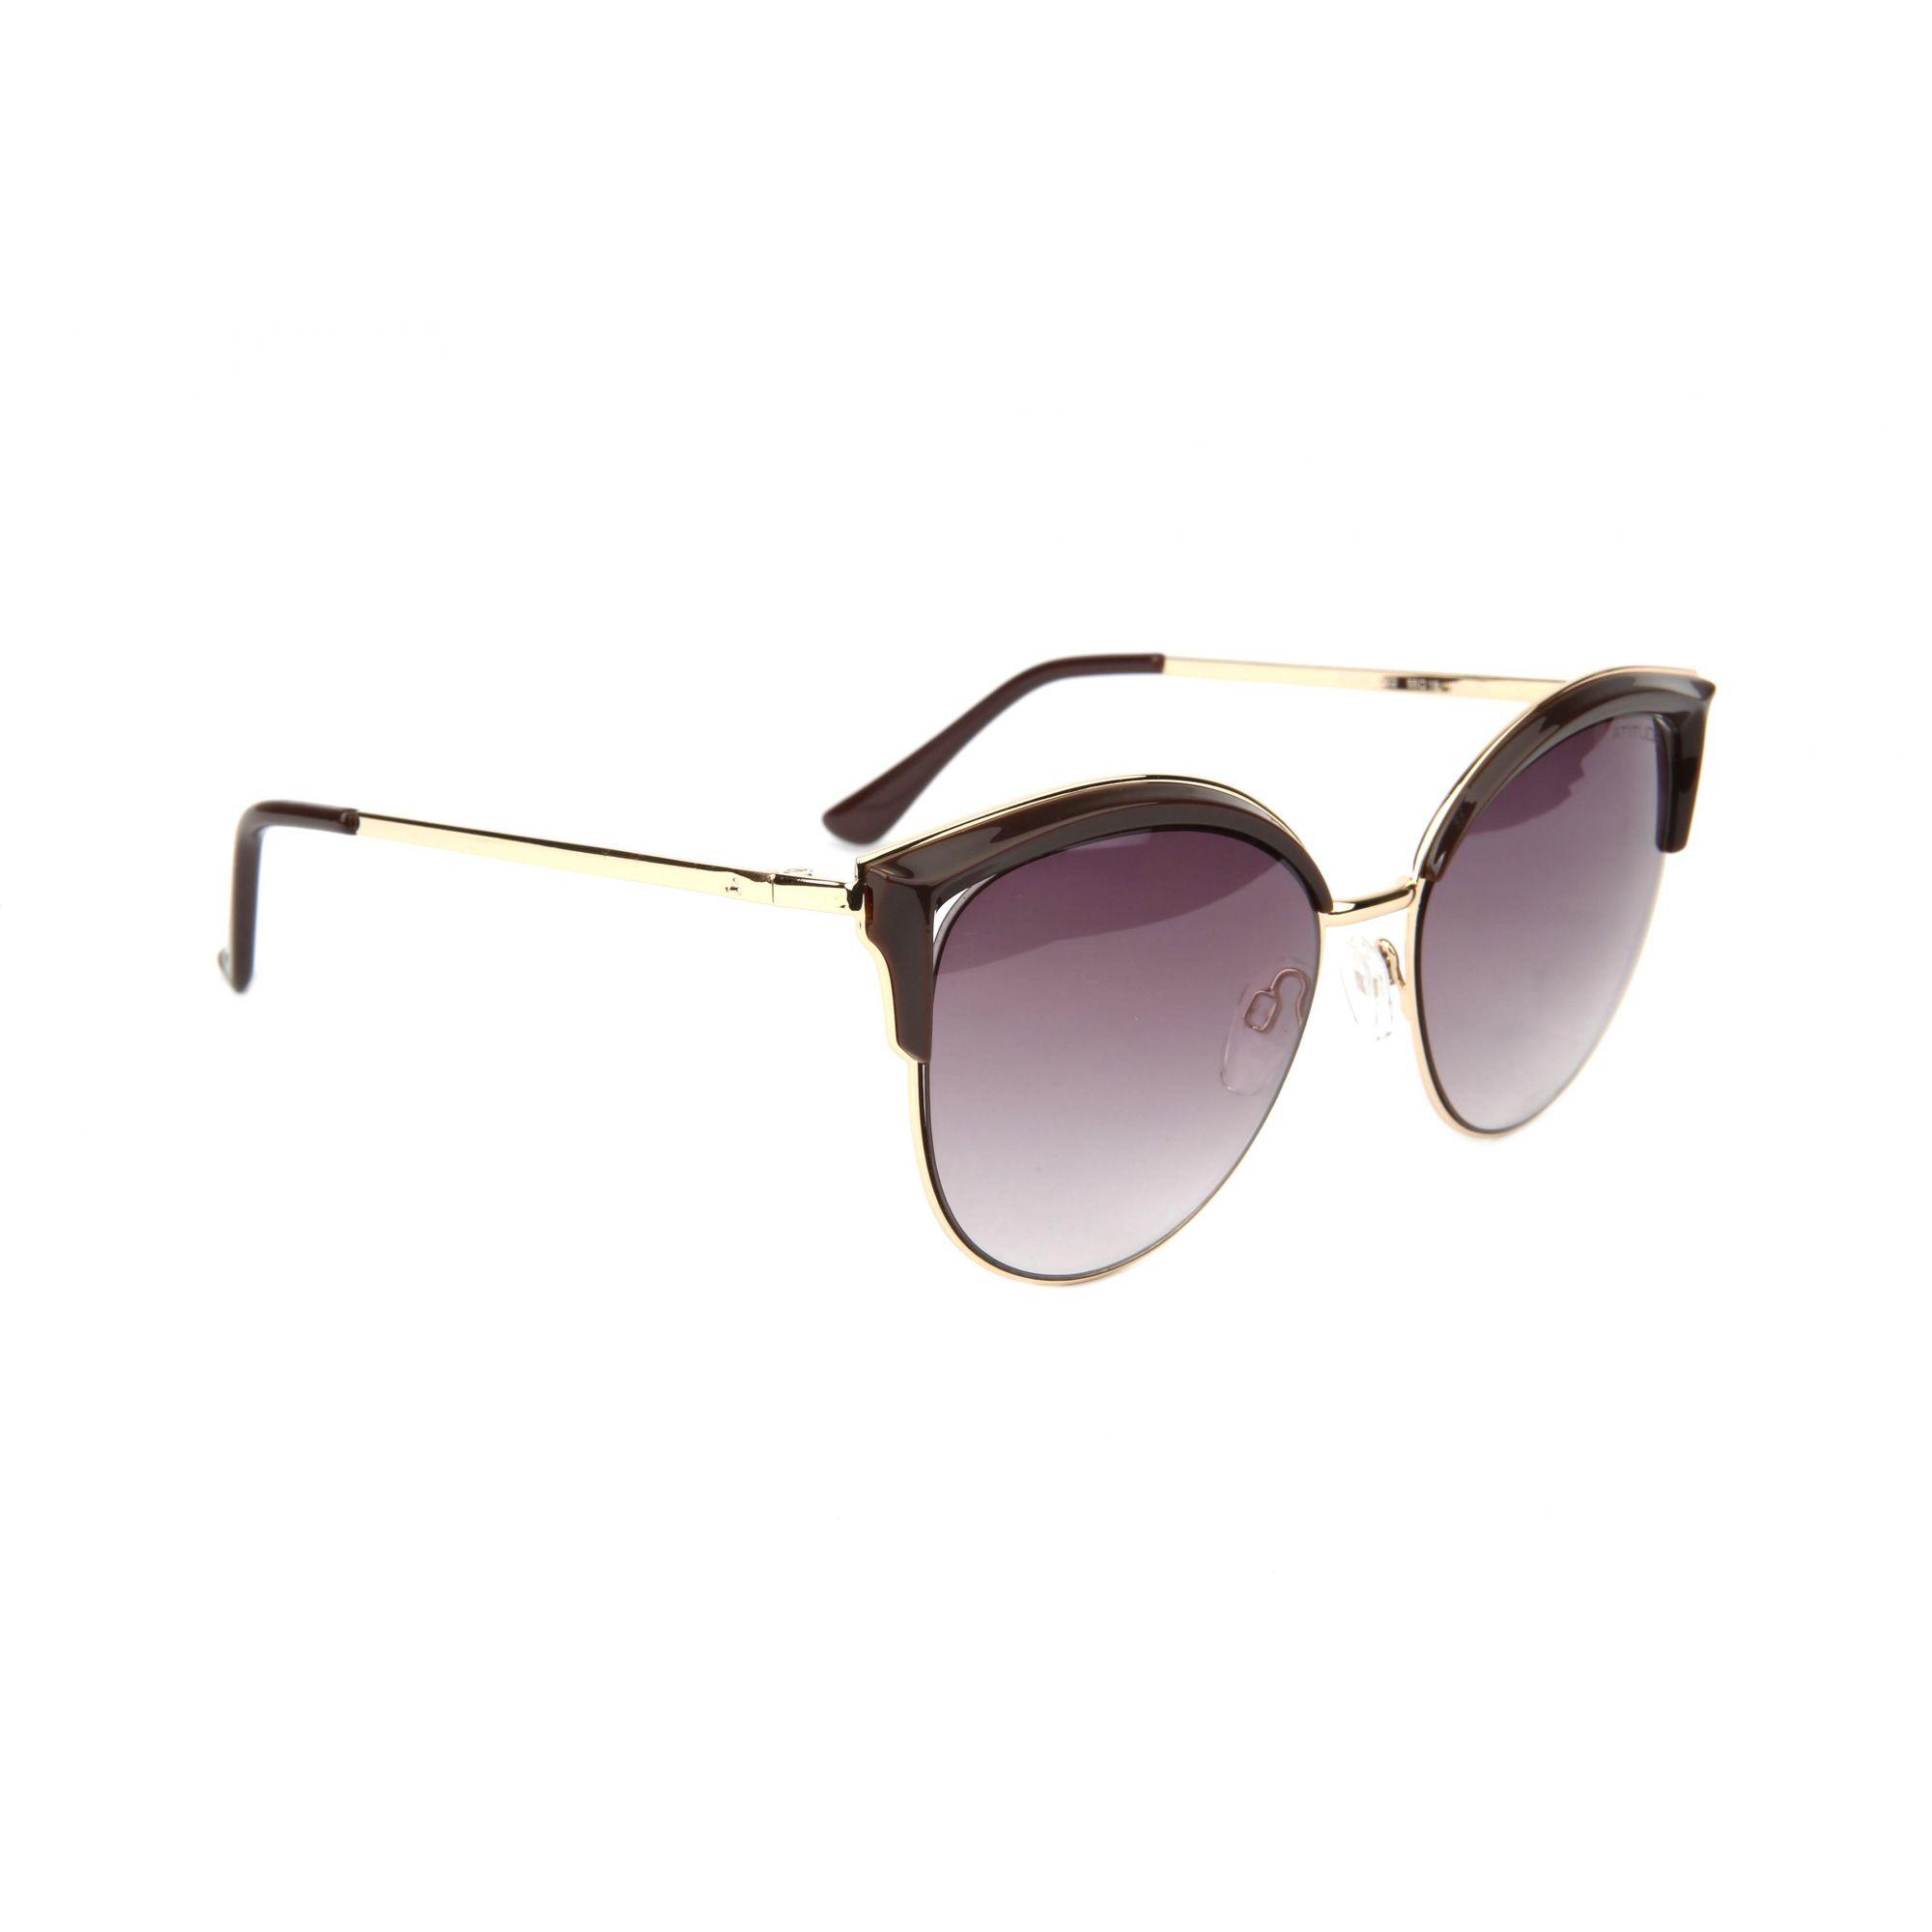 Óculos de Sol Atitude AT3230 D02 55